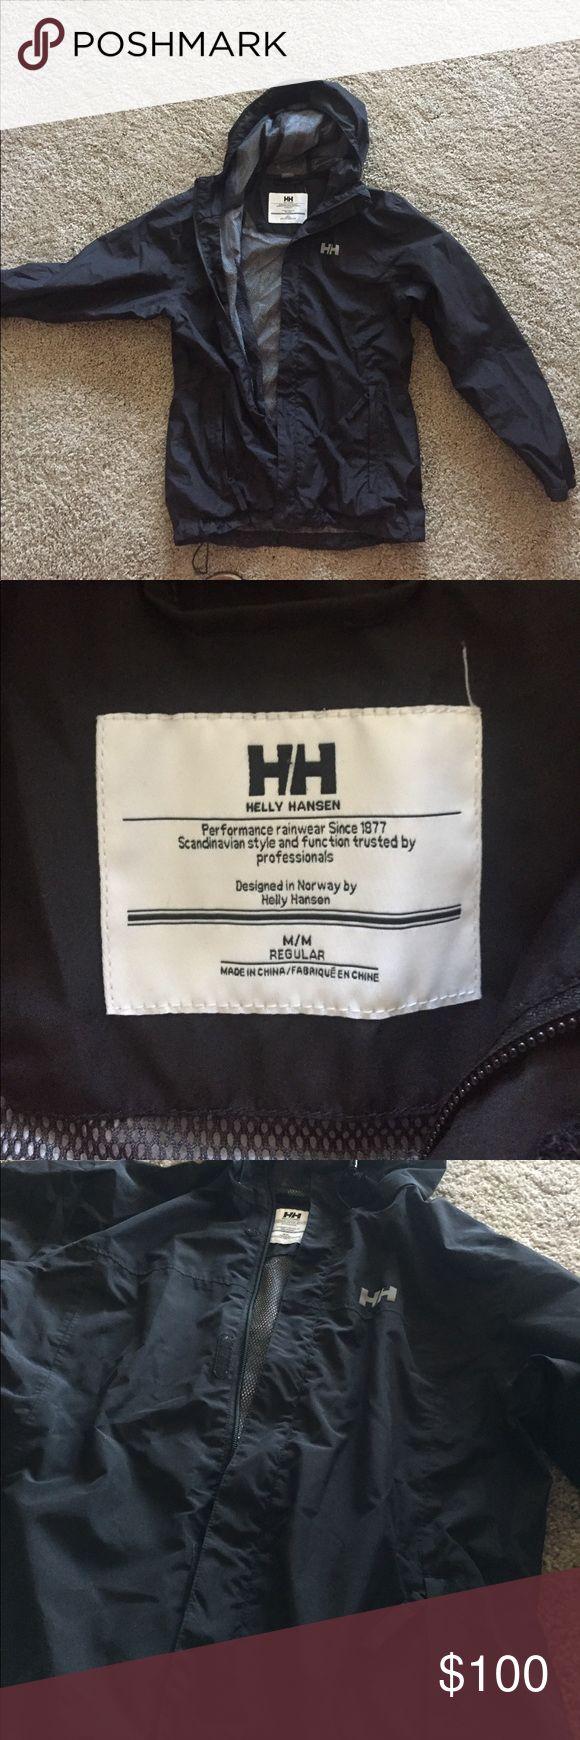 Helly Hansen Black Rain Jacket Pre loved. Black. Helly Hansen authentic. Size med Helly Hansen Jackets & Coats